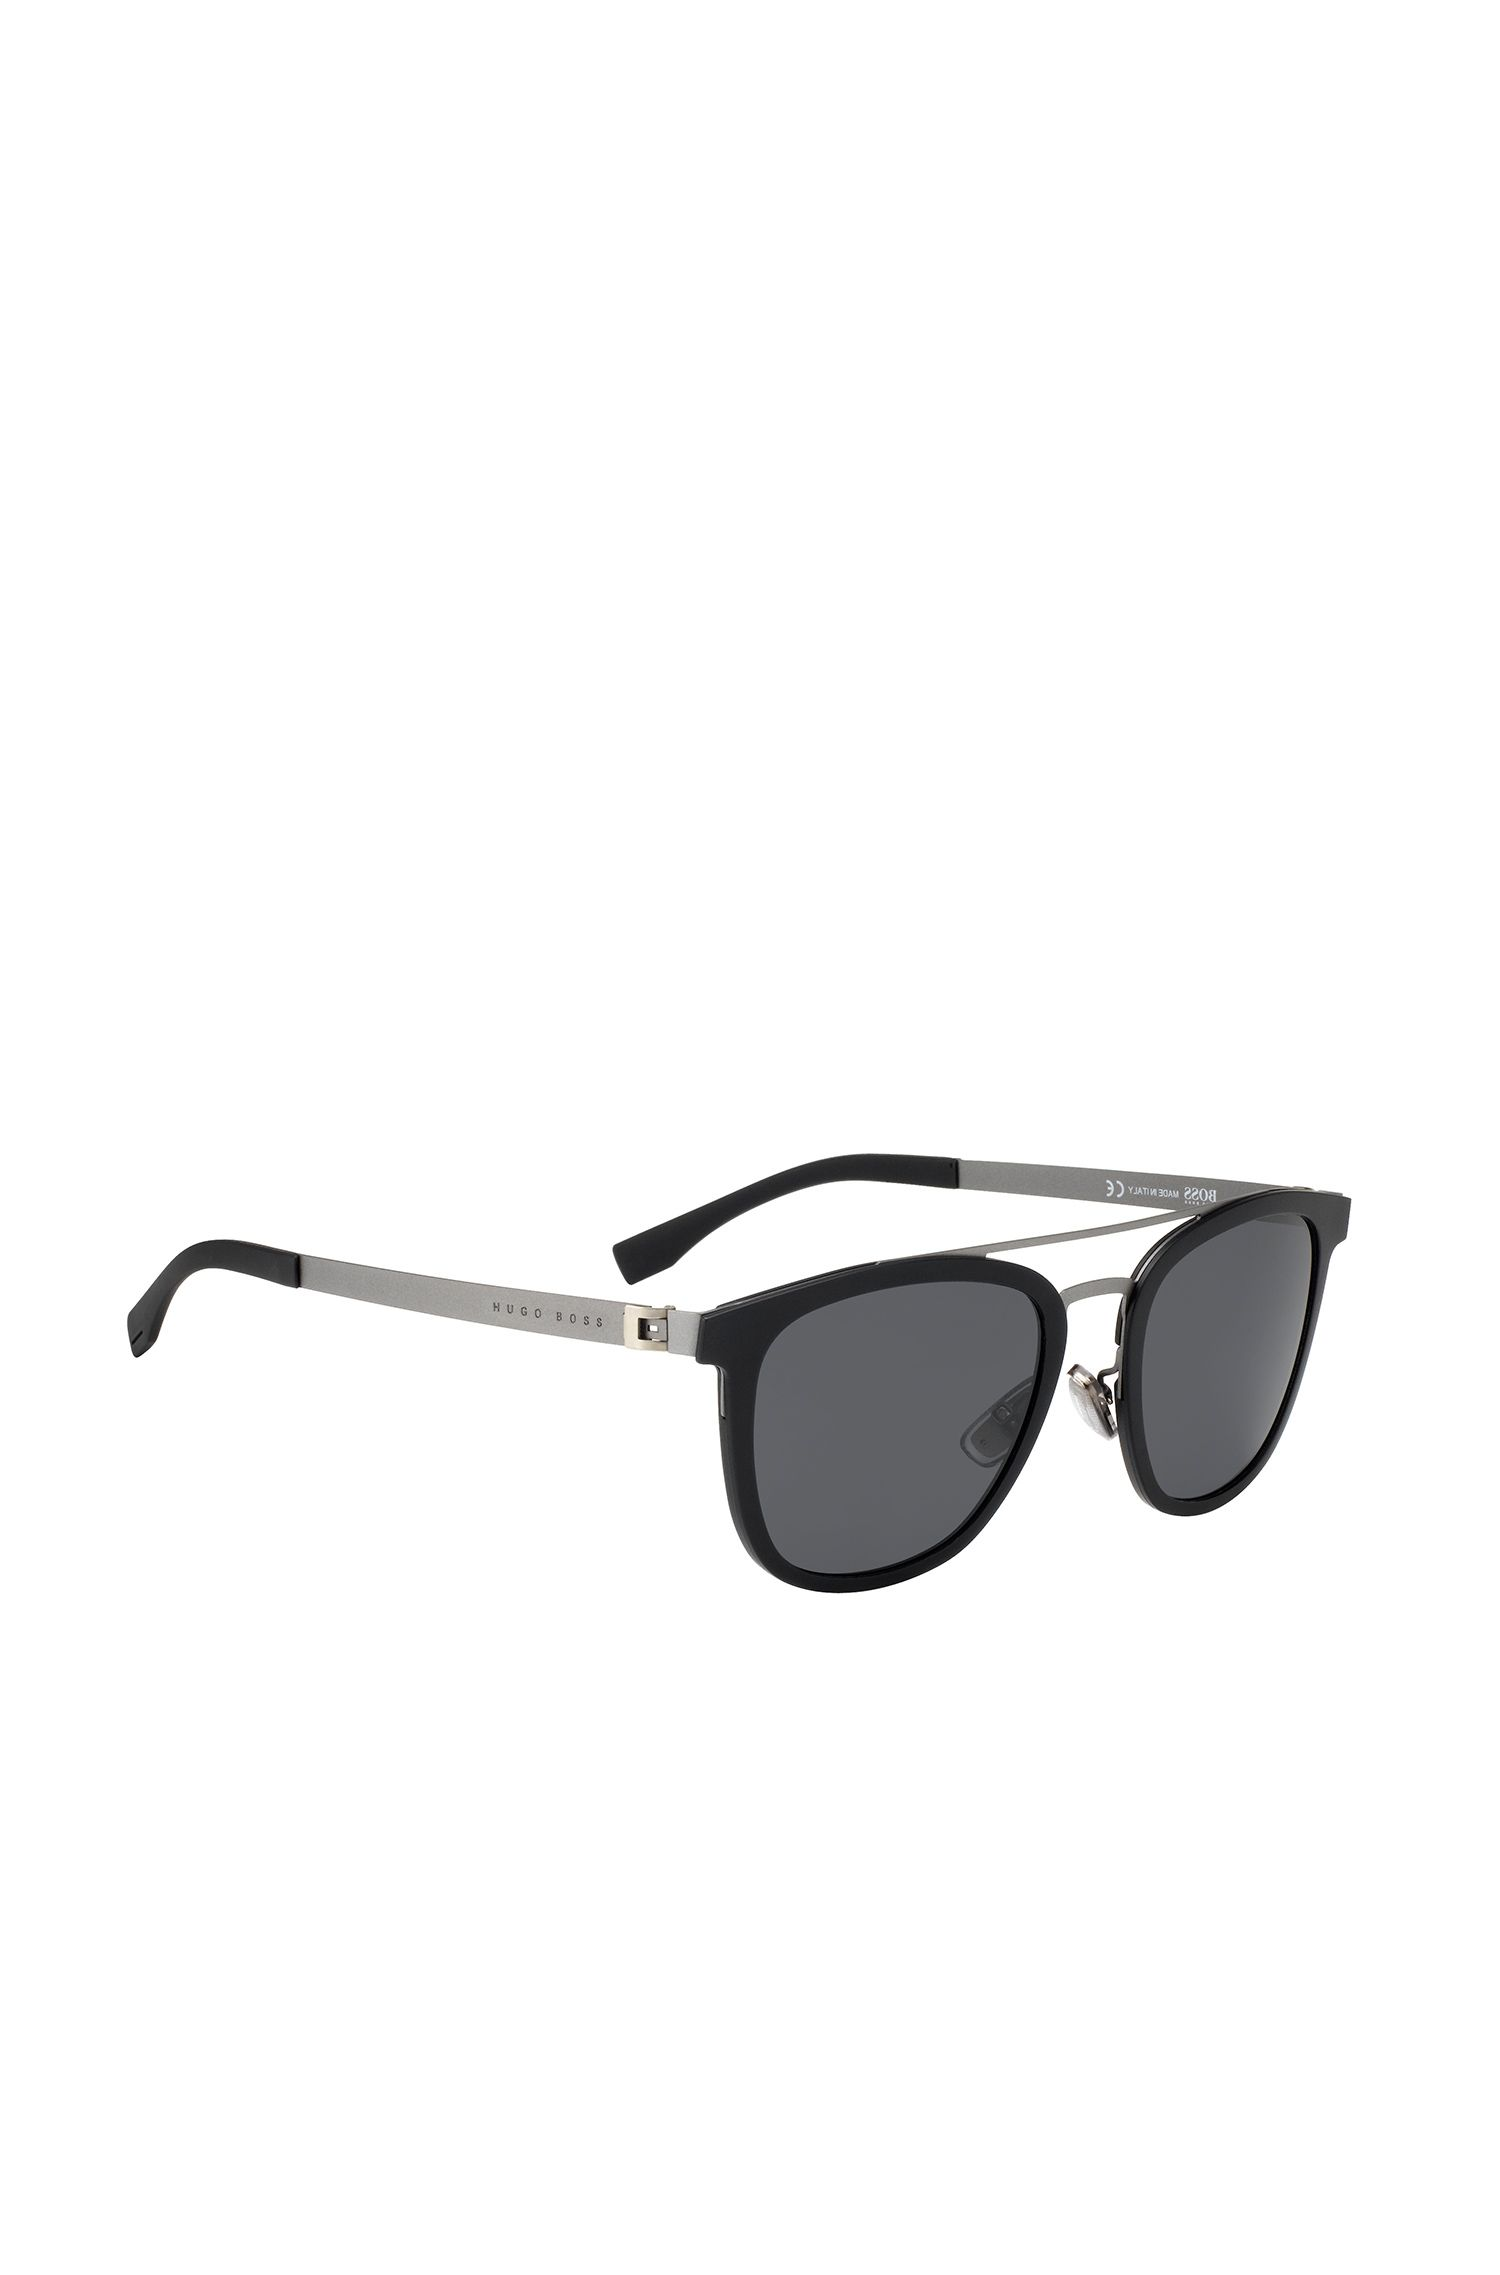 Acetate Stainless Steel Round Sunglasses | BOSS 0838S